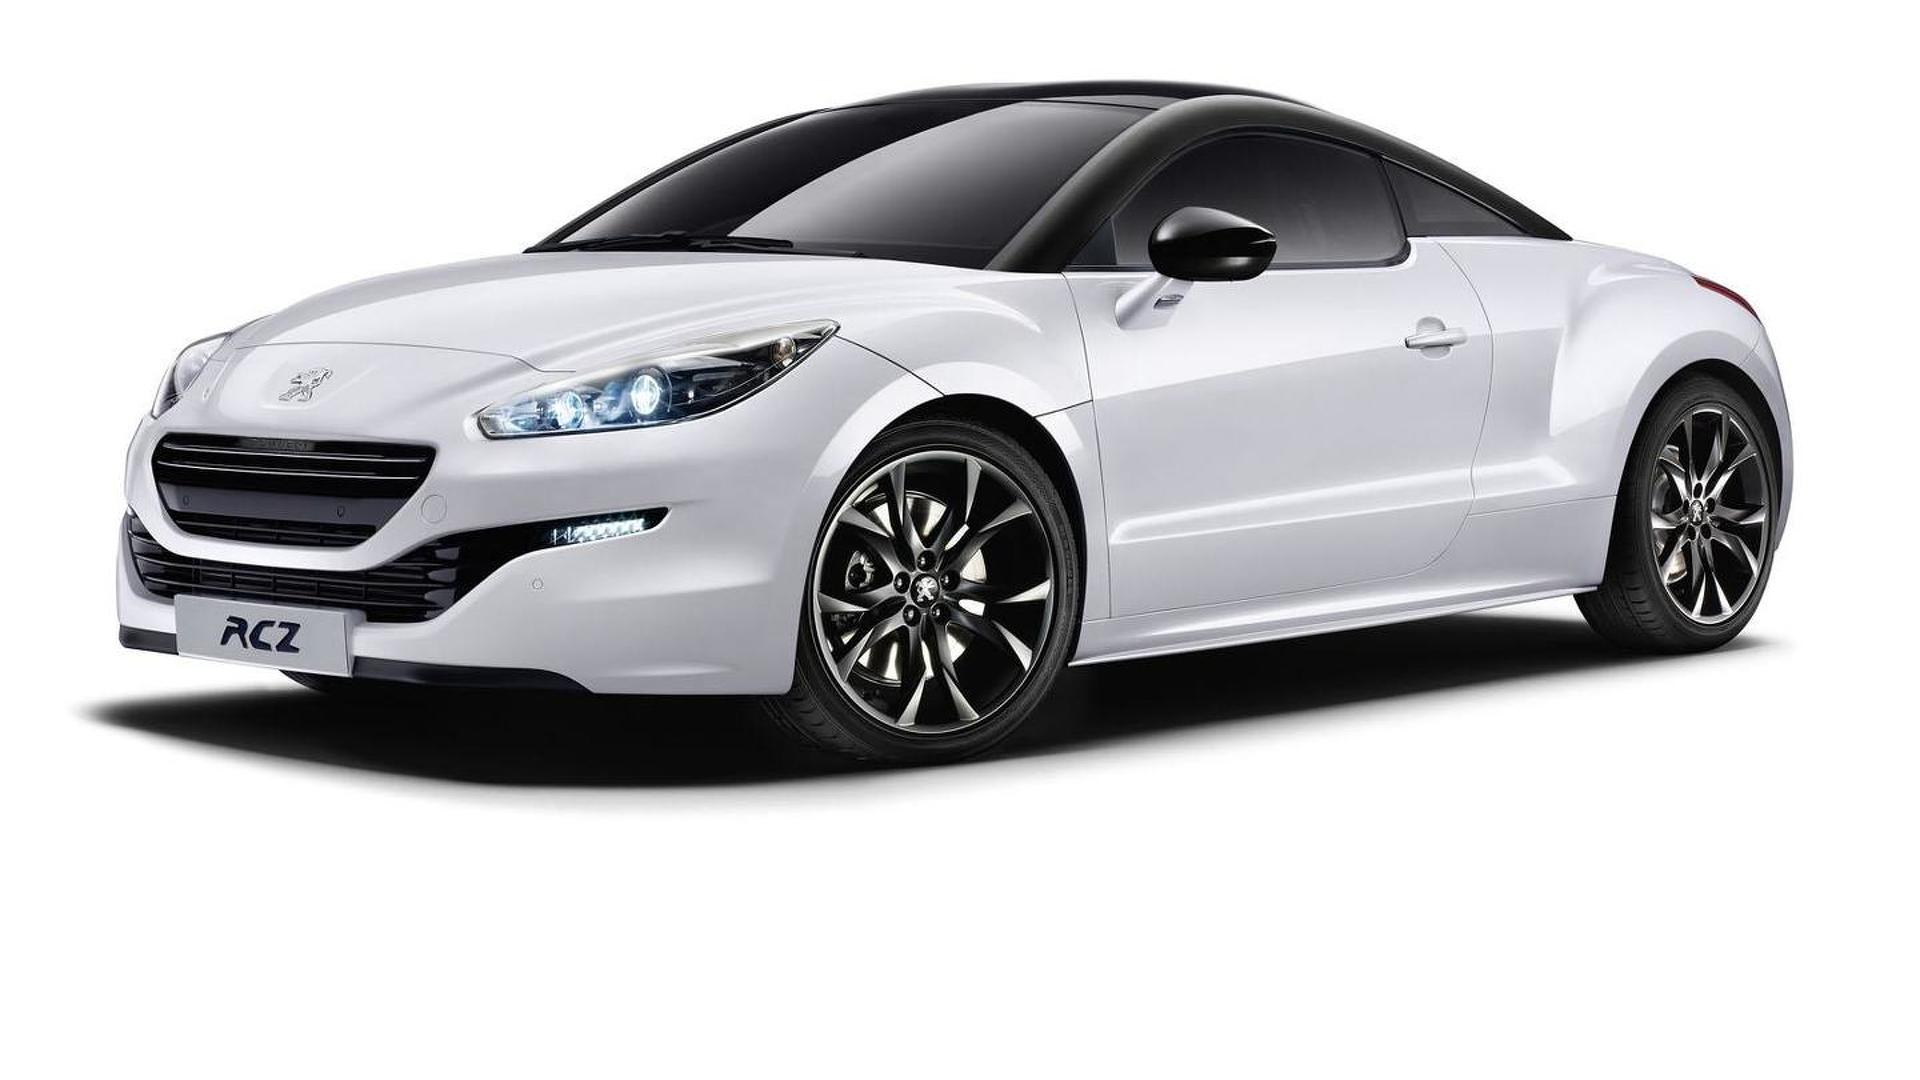 Peugeot RCZ Magnetic Edition announced